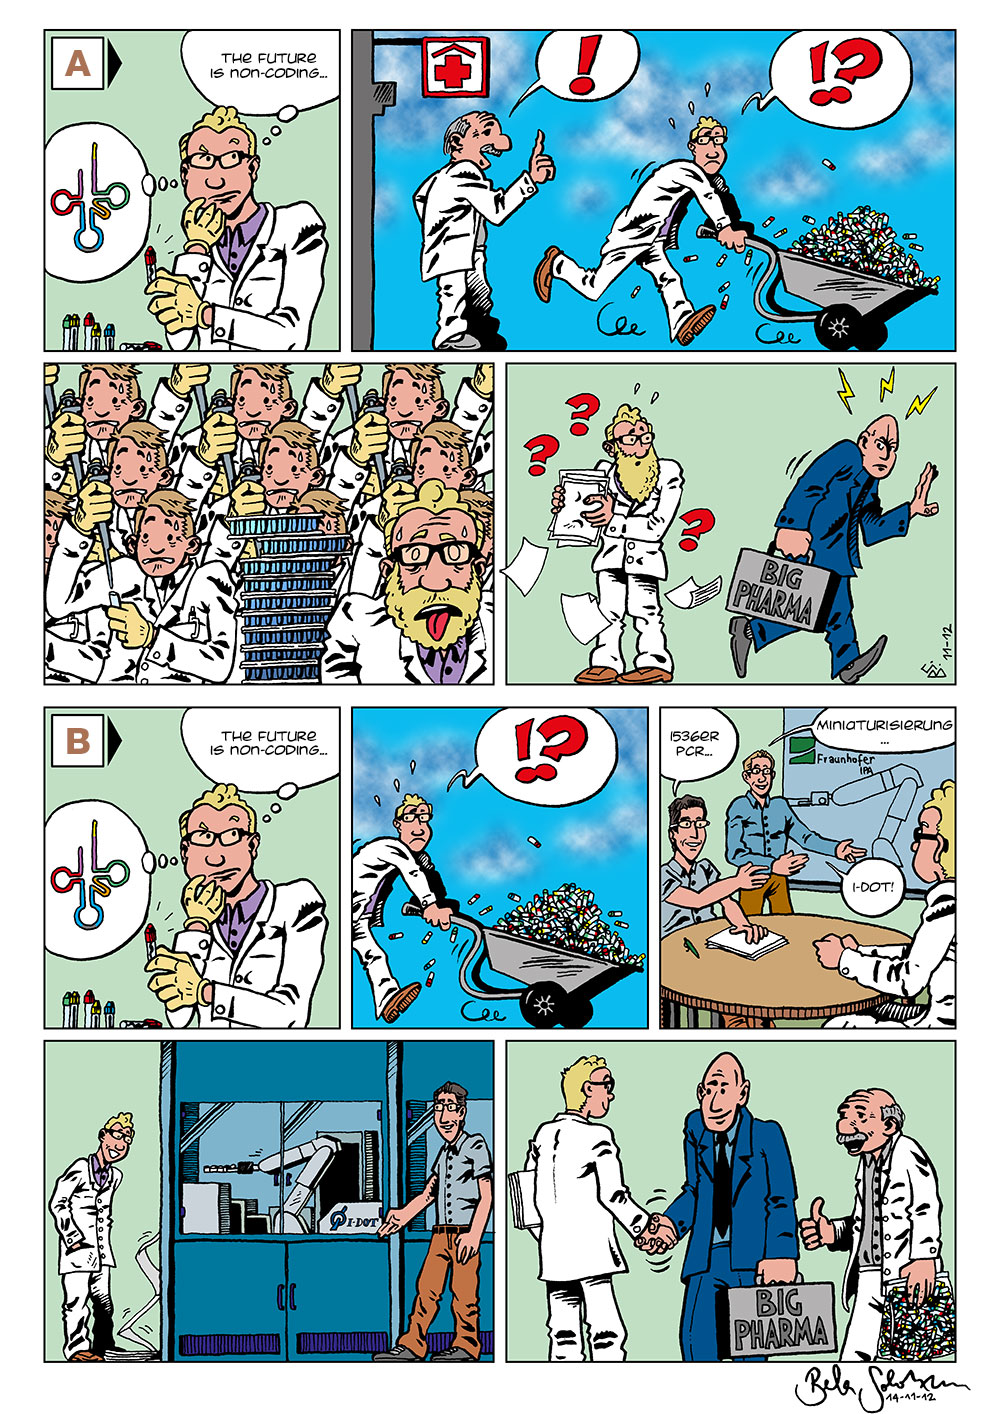 fraunhofer_ipa_comic_2012